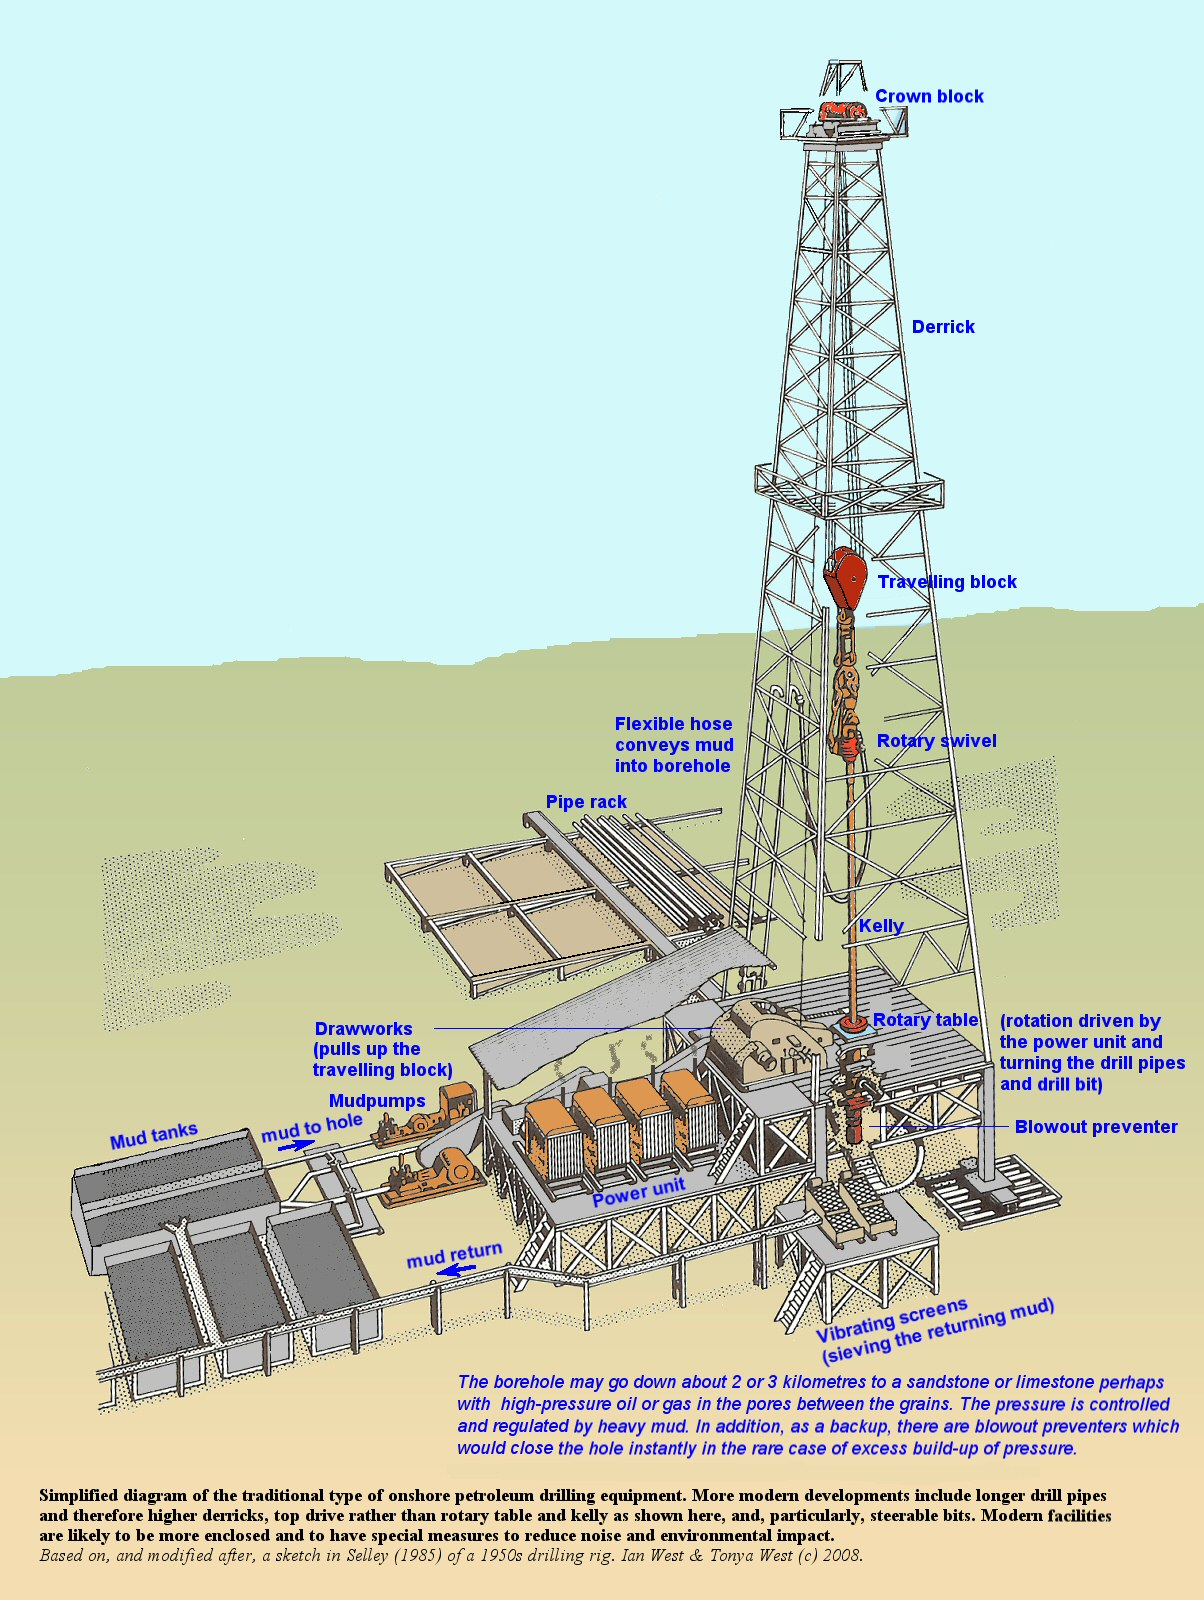 1204x1600 Onshore Petroleum Drilling Equipment Diagram Terminology.jpg (1204